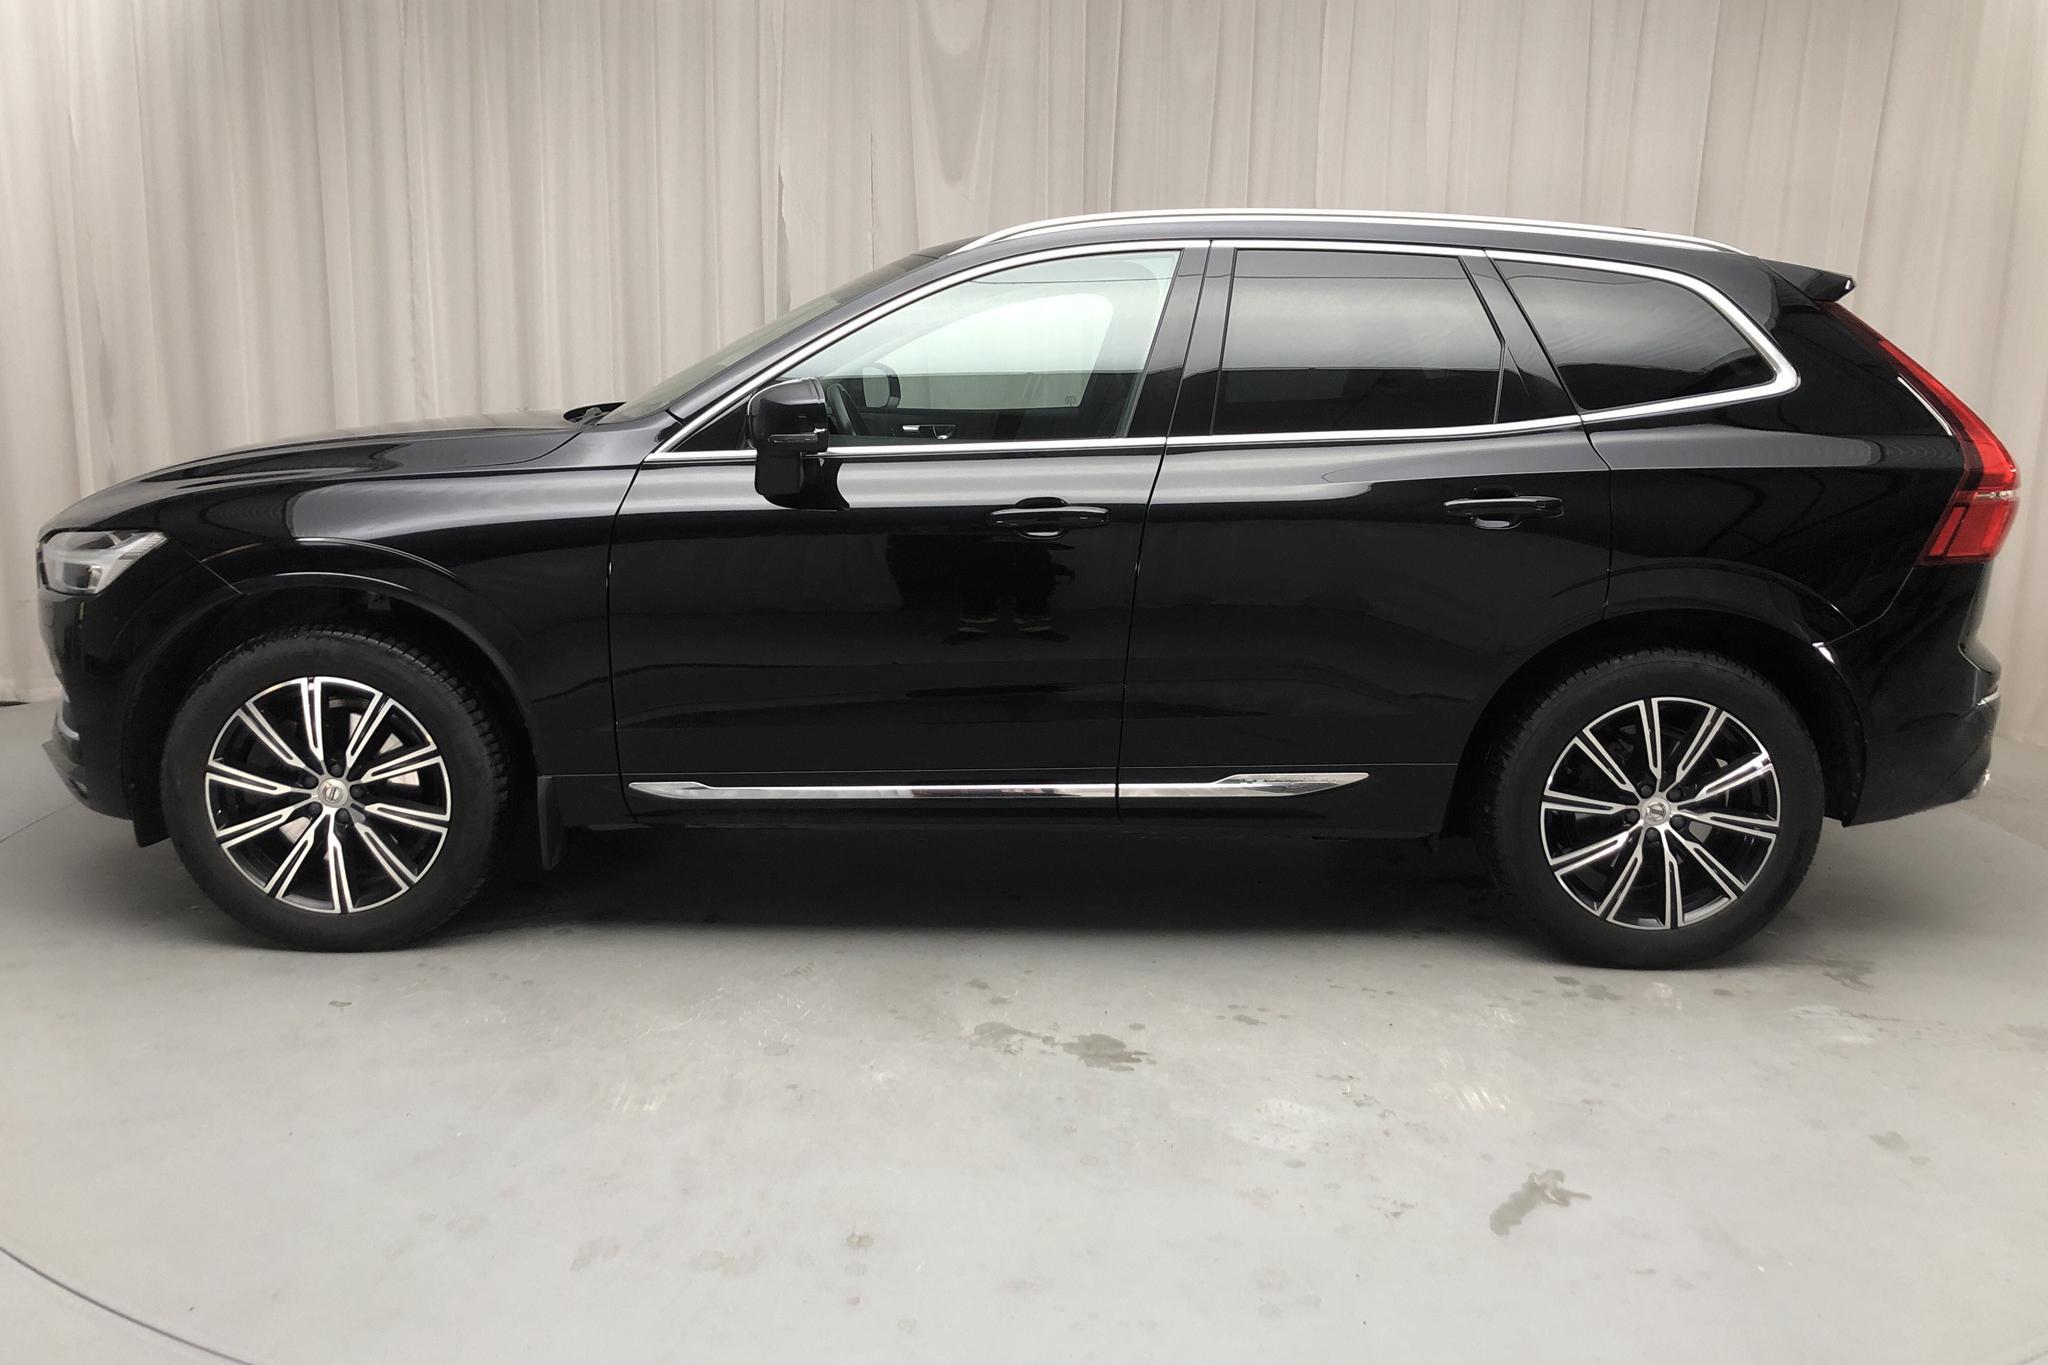 Volvo XC60 D5 AWD (235hk) - 140 280 km - Automatic - black - 2019